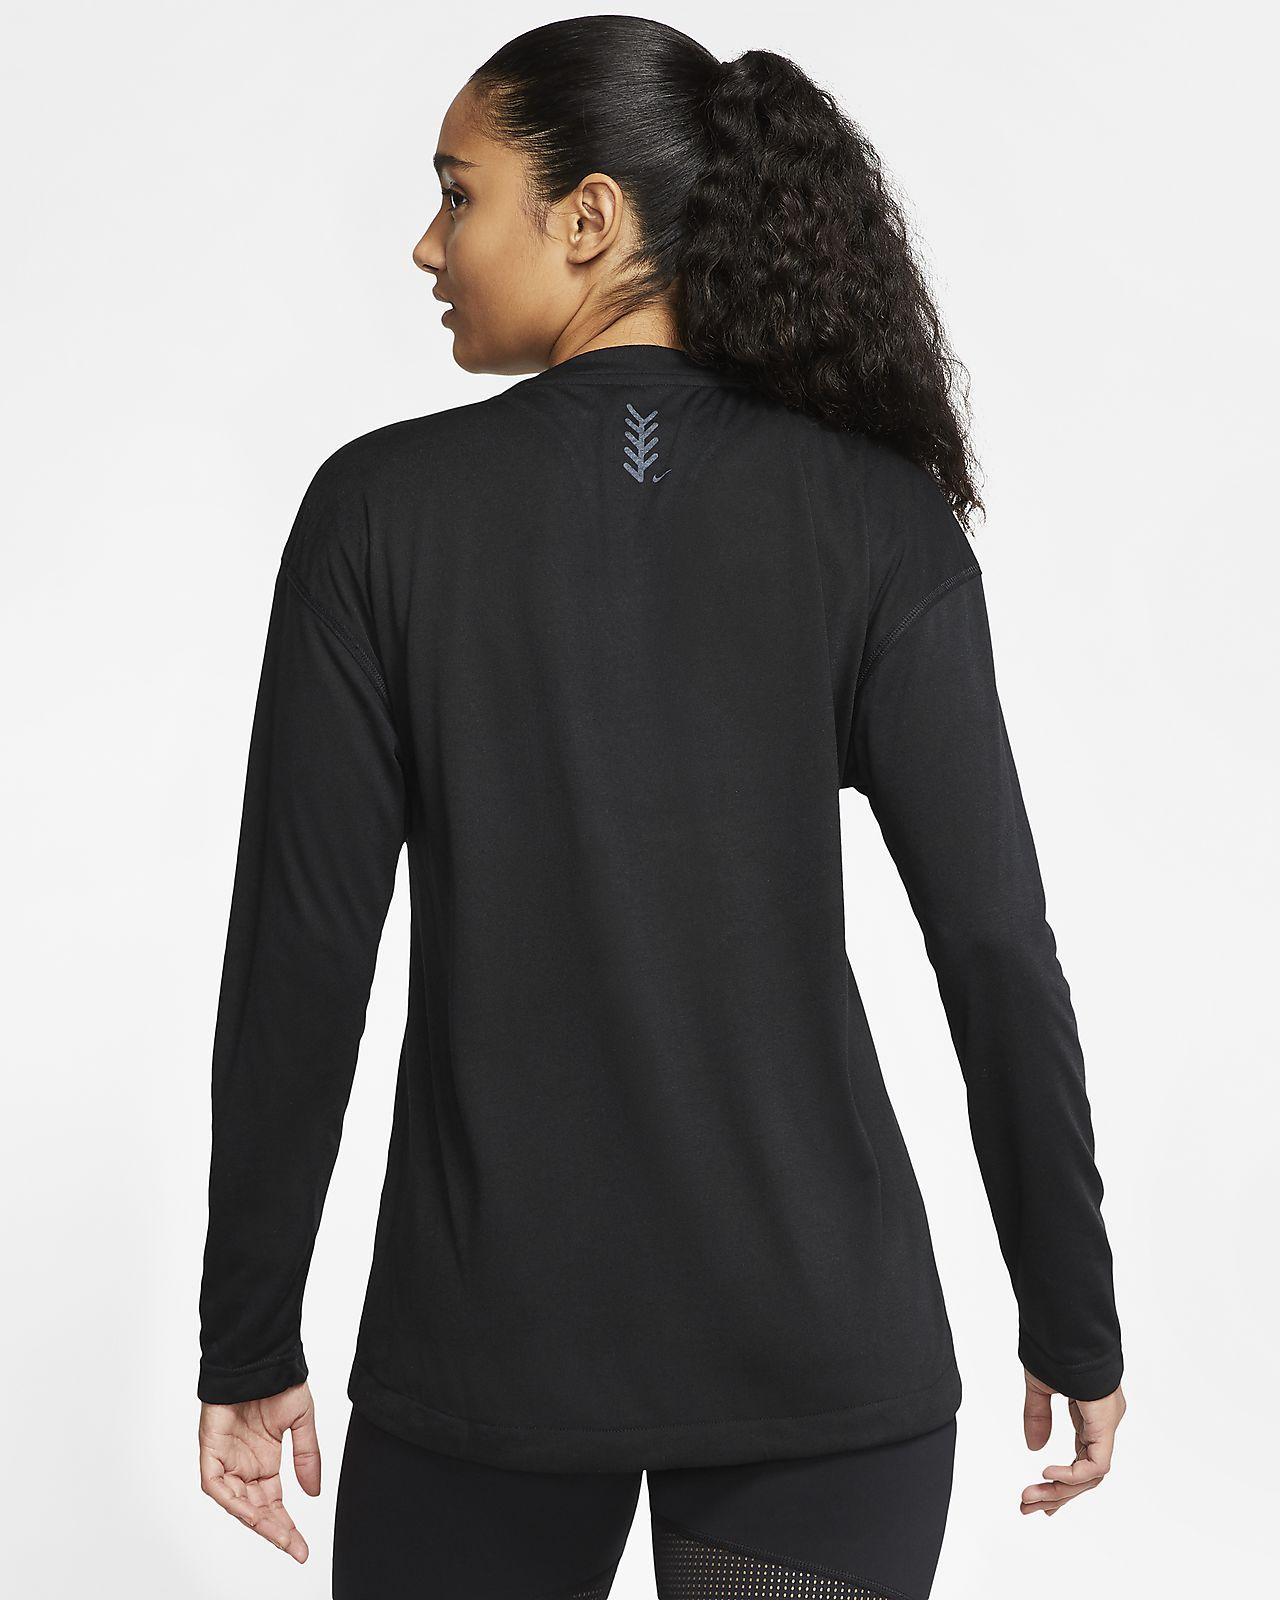 Nike Breathe Women's Long Sleeve Softball Top